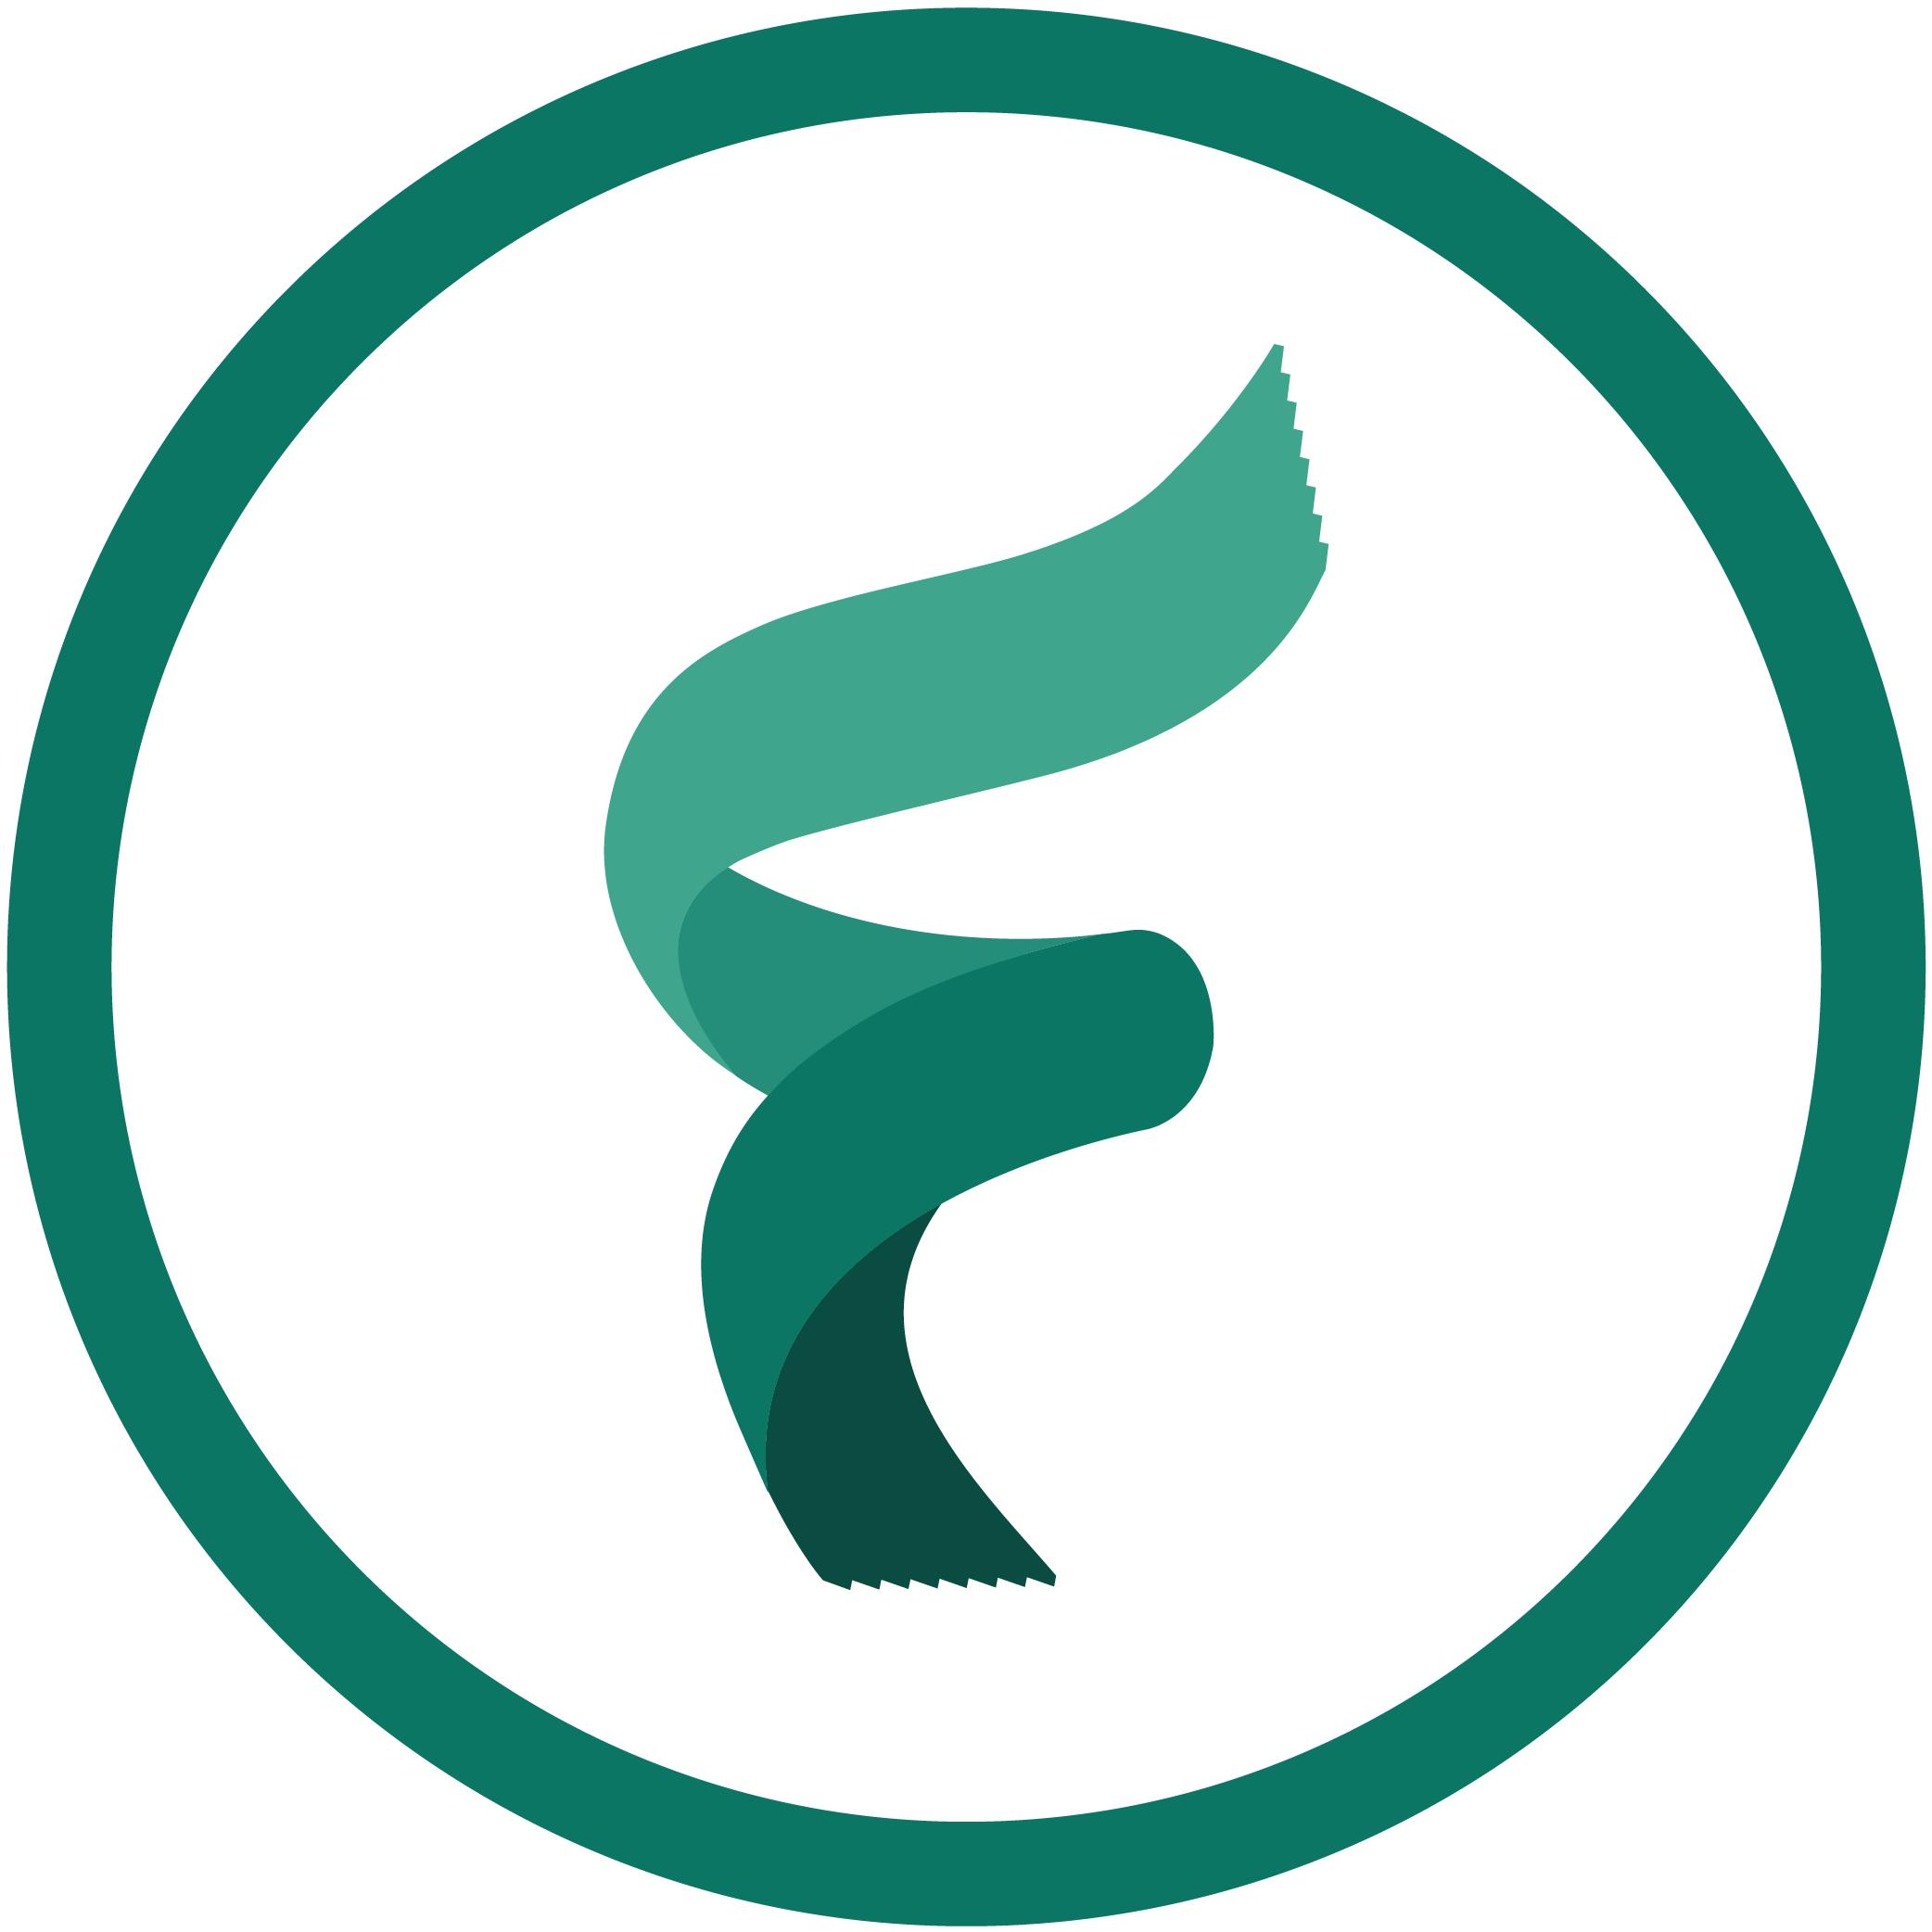 Receipts reimagined 🌿 (tryflux) Profile Image | Linktree